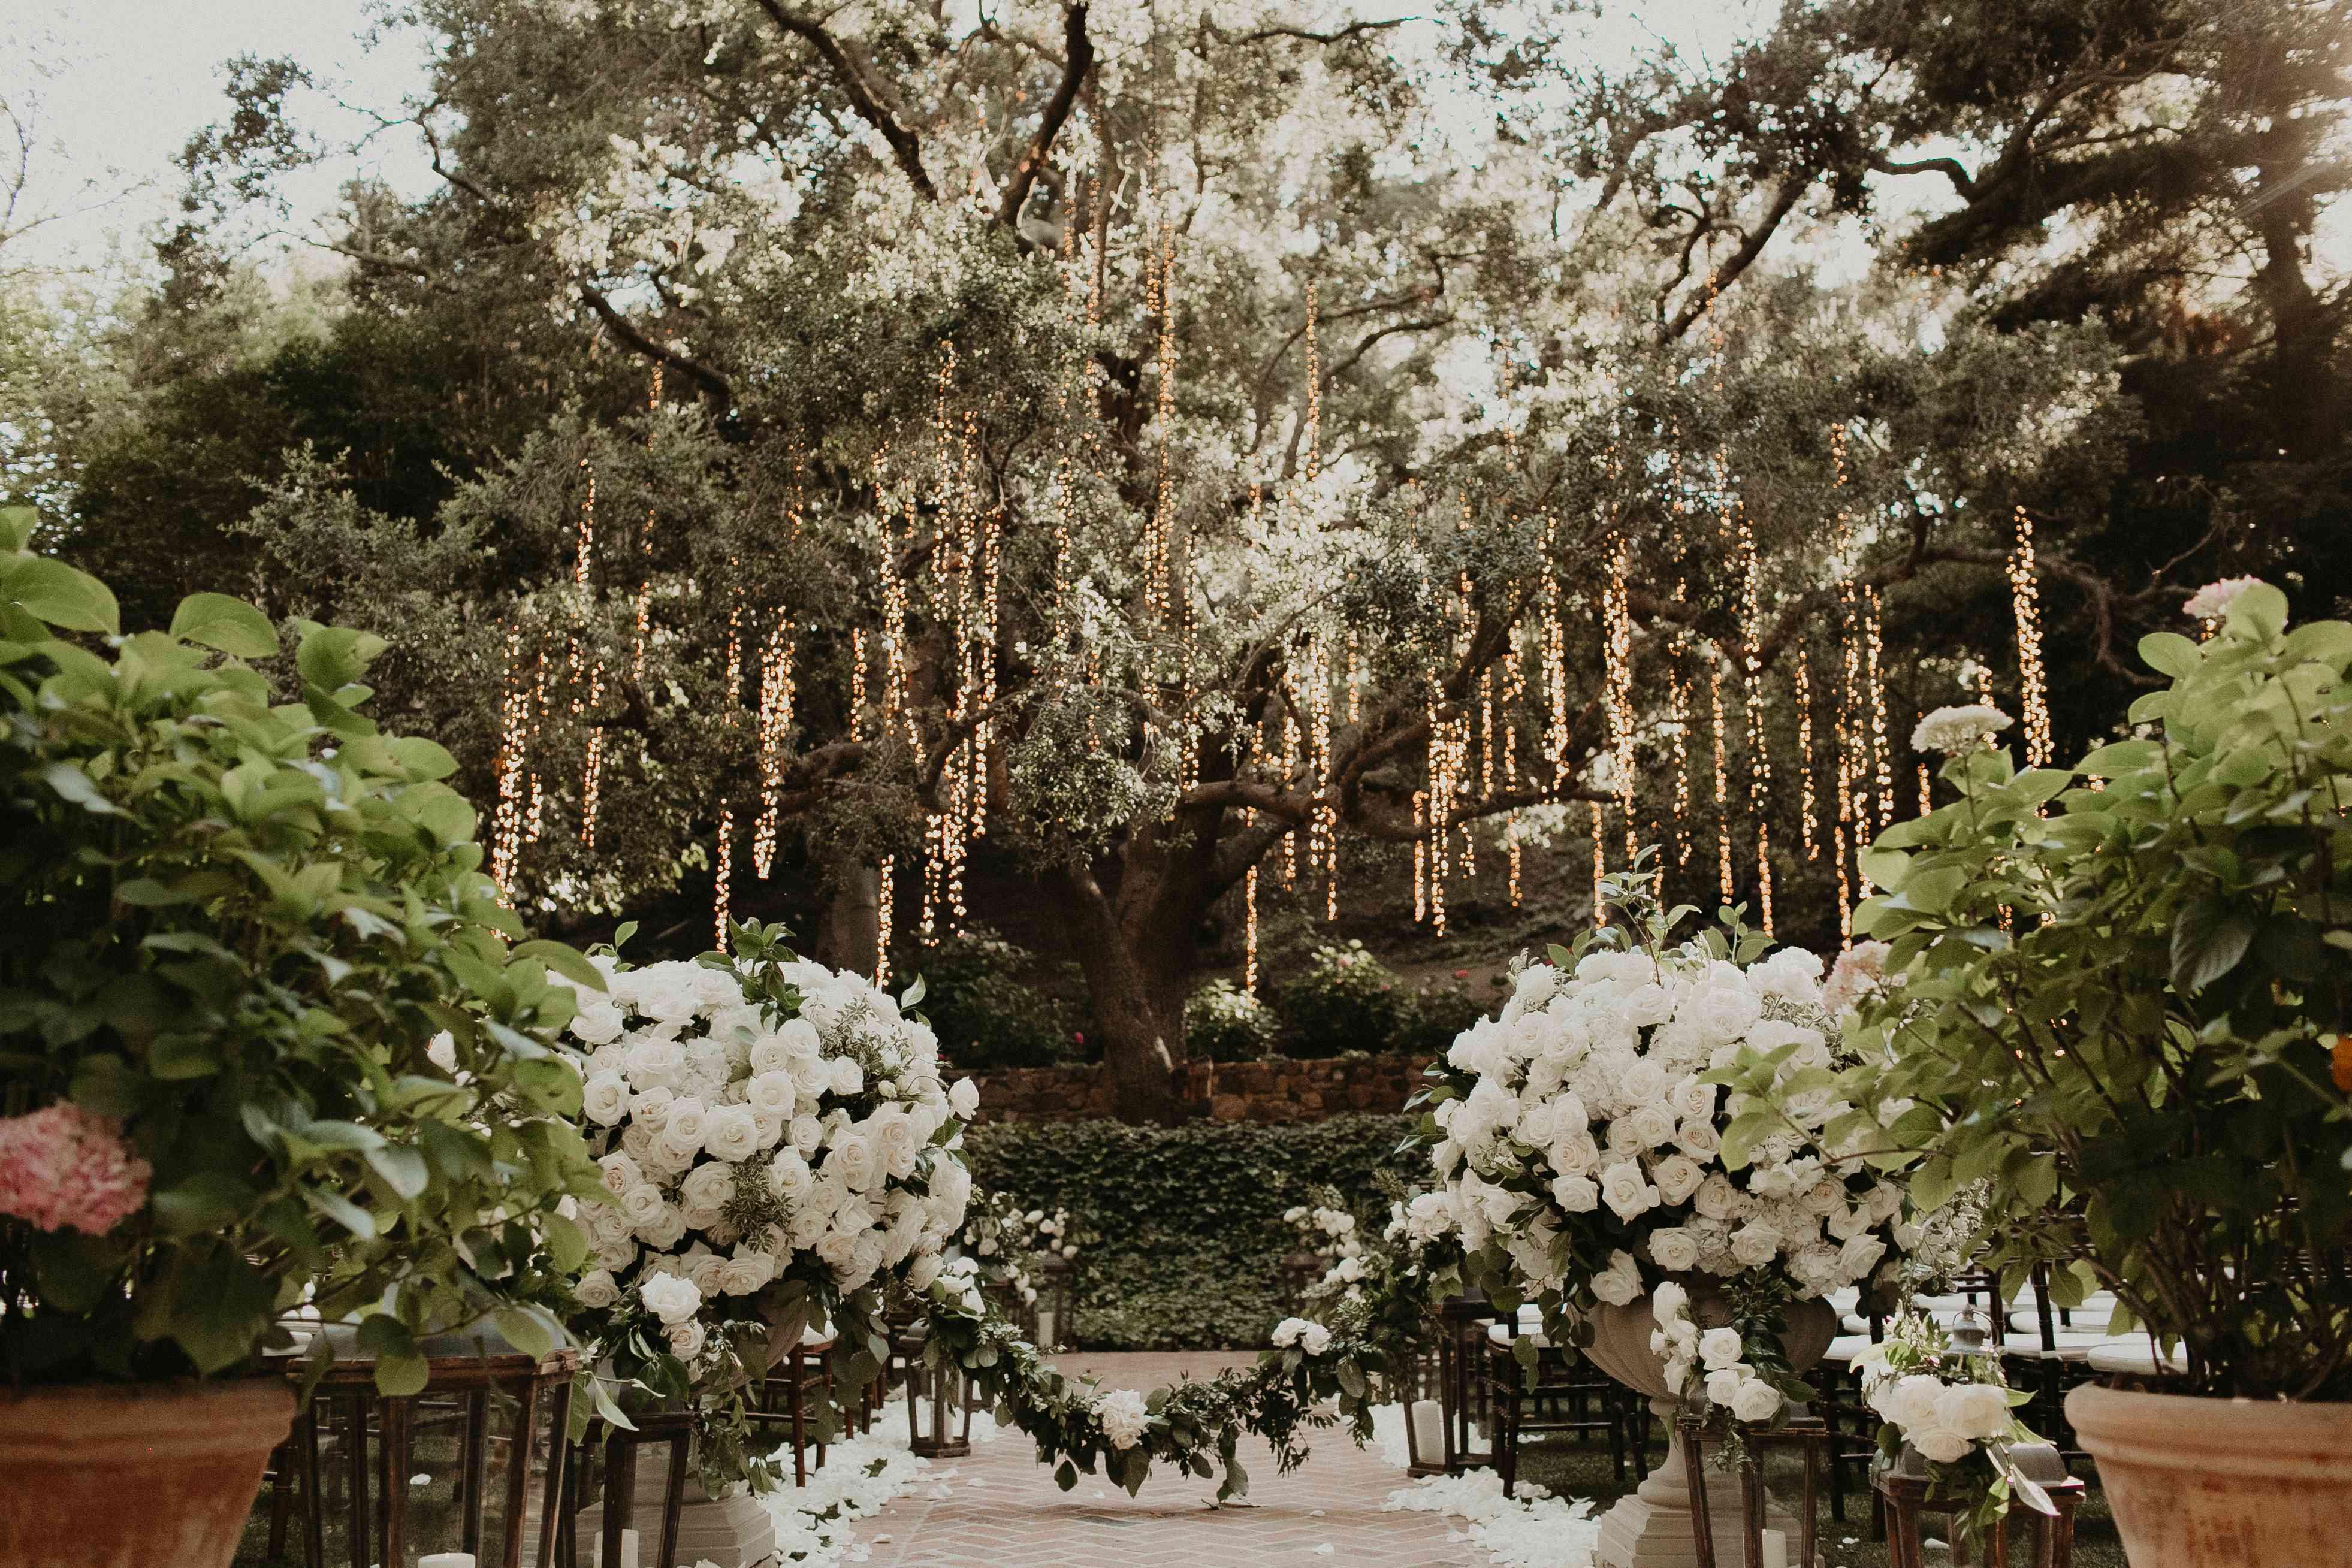 Baker Mayfield Wedding, ceremony decor